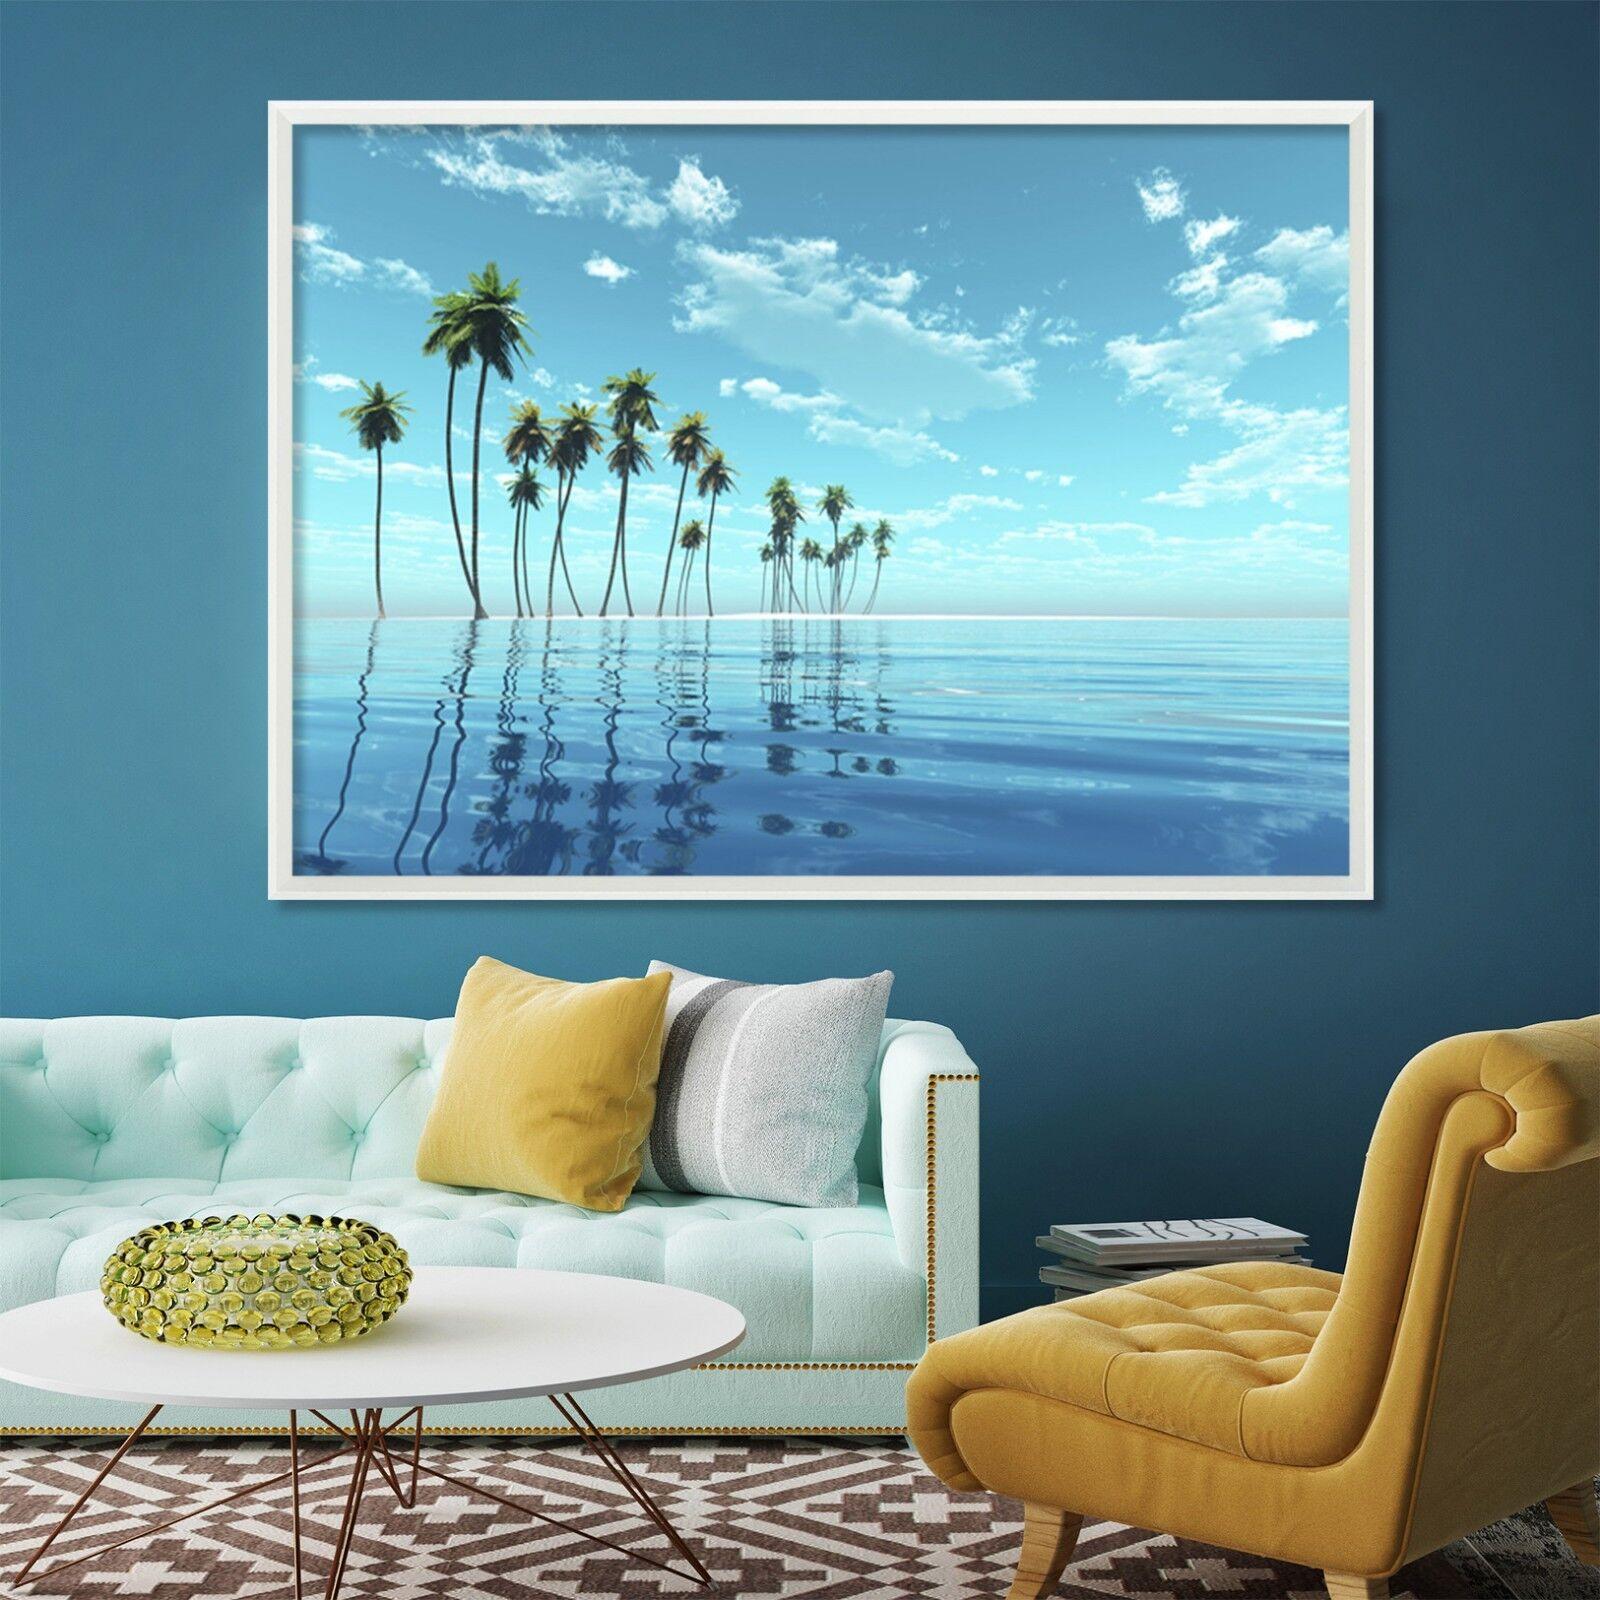 3D Coconut Island 52 Framed Poster Home Decor Print Painting Art AJ WALLPAPER